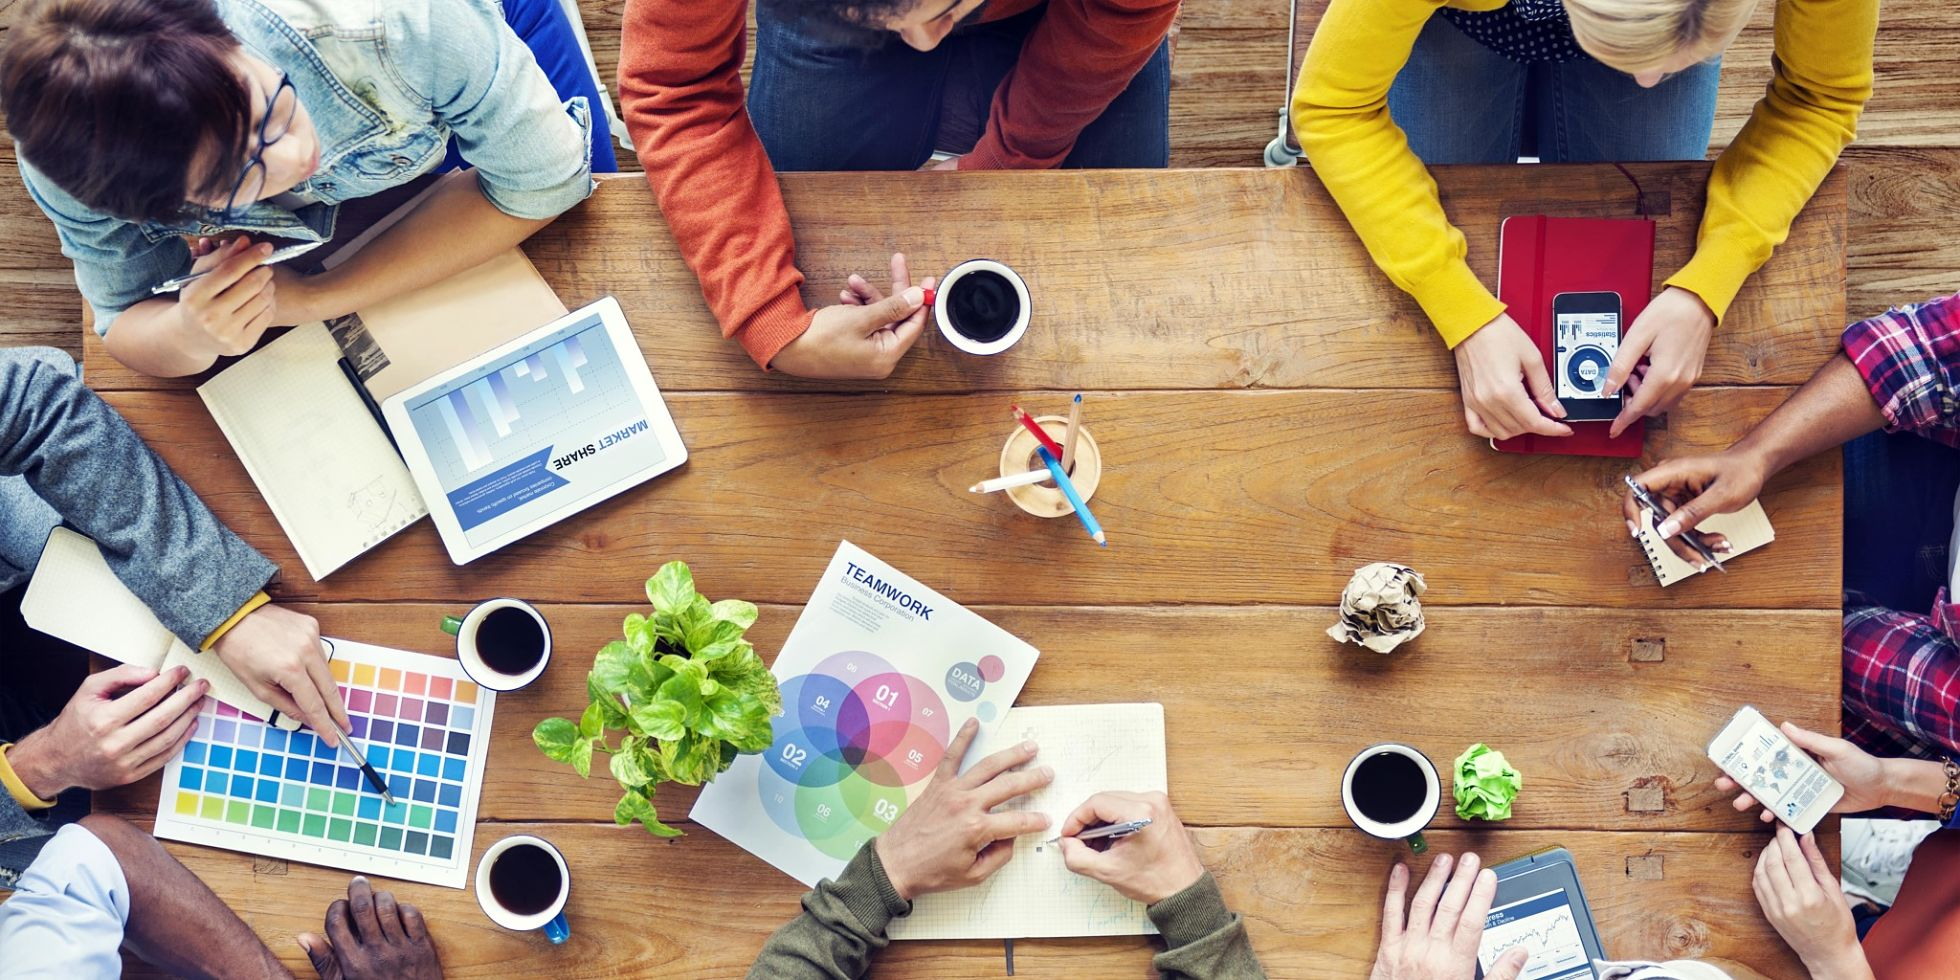 The Team, creative branding agency, brand strategy, brand purpose, brand identity, employee engagement, London agency, design, good design, design thinking